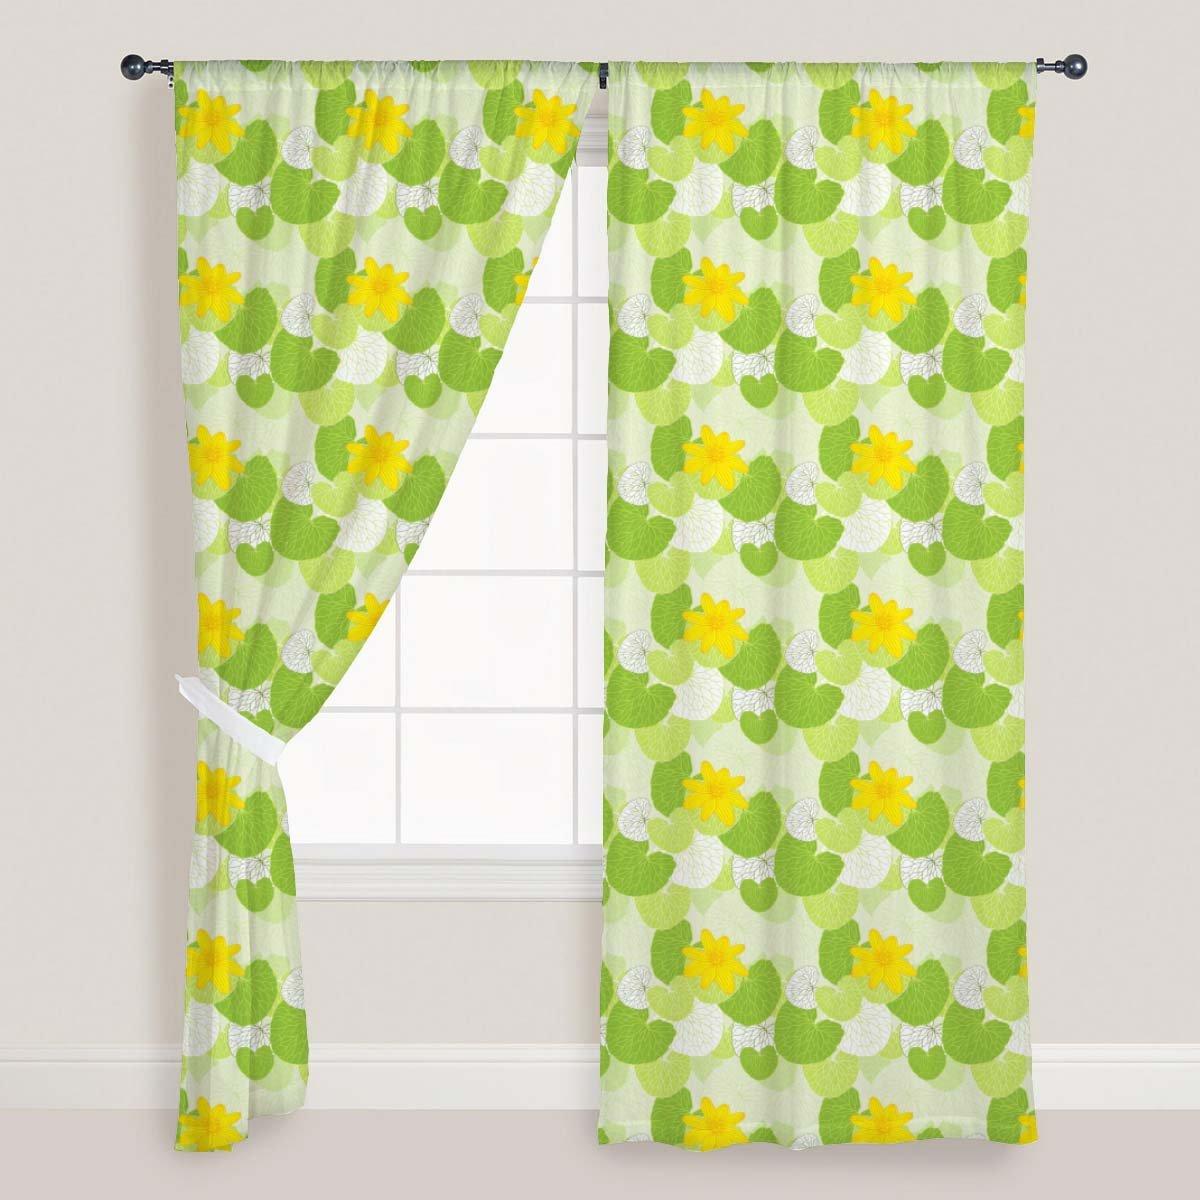 AZ Green Leaves Door & Window Curtain Satin 4feet x 10feet; SET OF 3 PCS